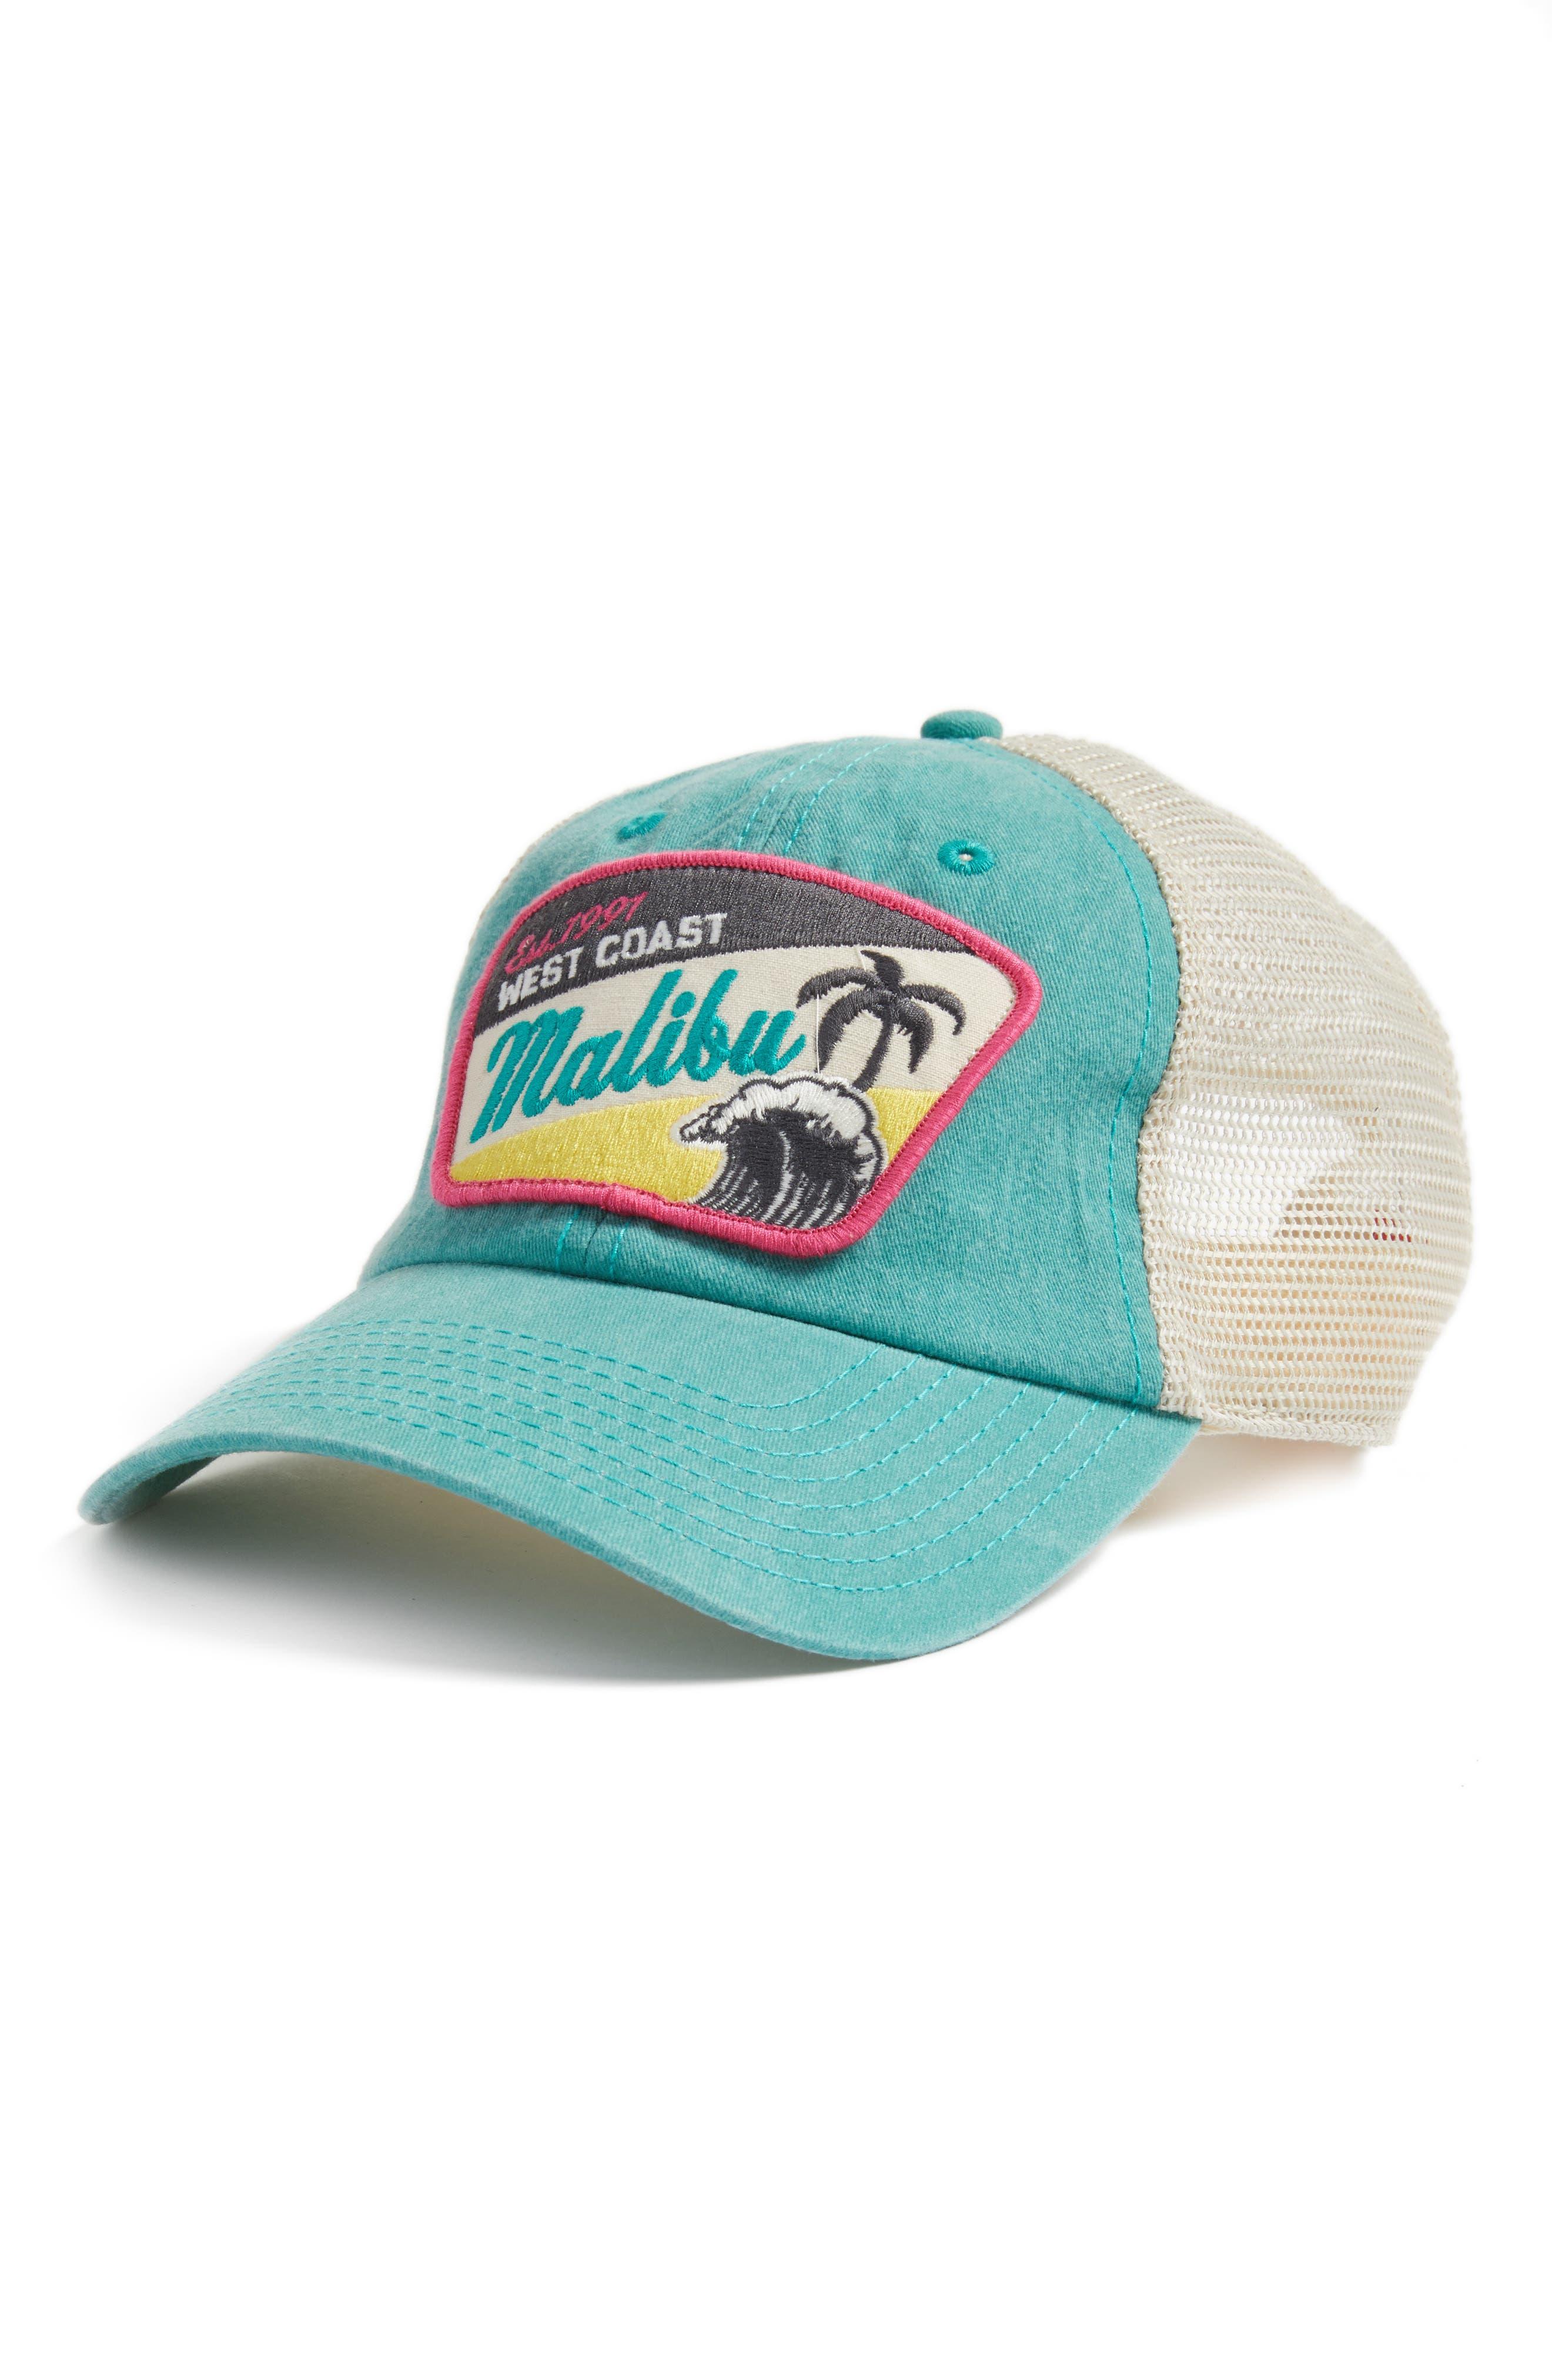 Alternate Image 1 Selected - American Needle Ravenswood - Destination Malibu Hat